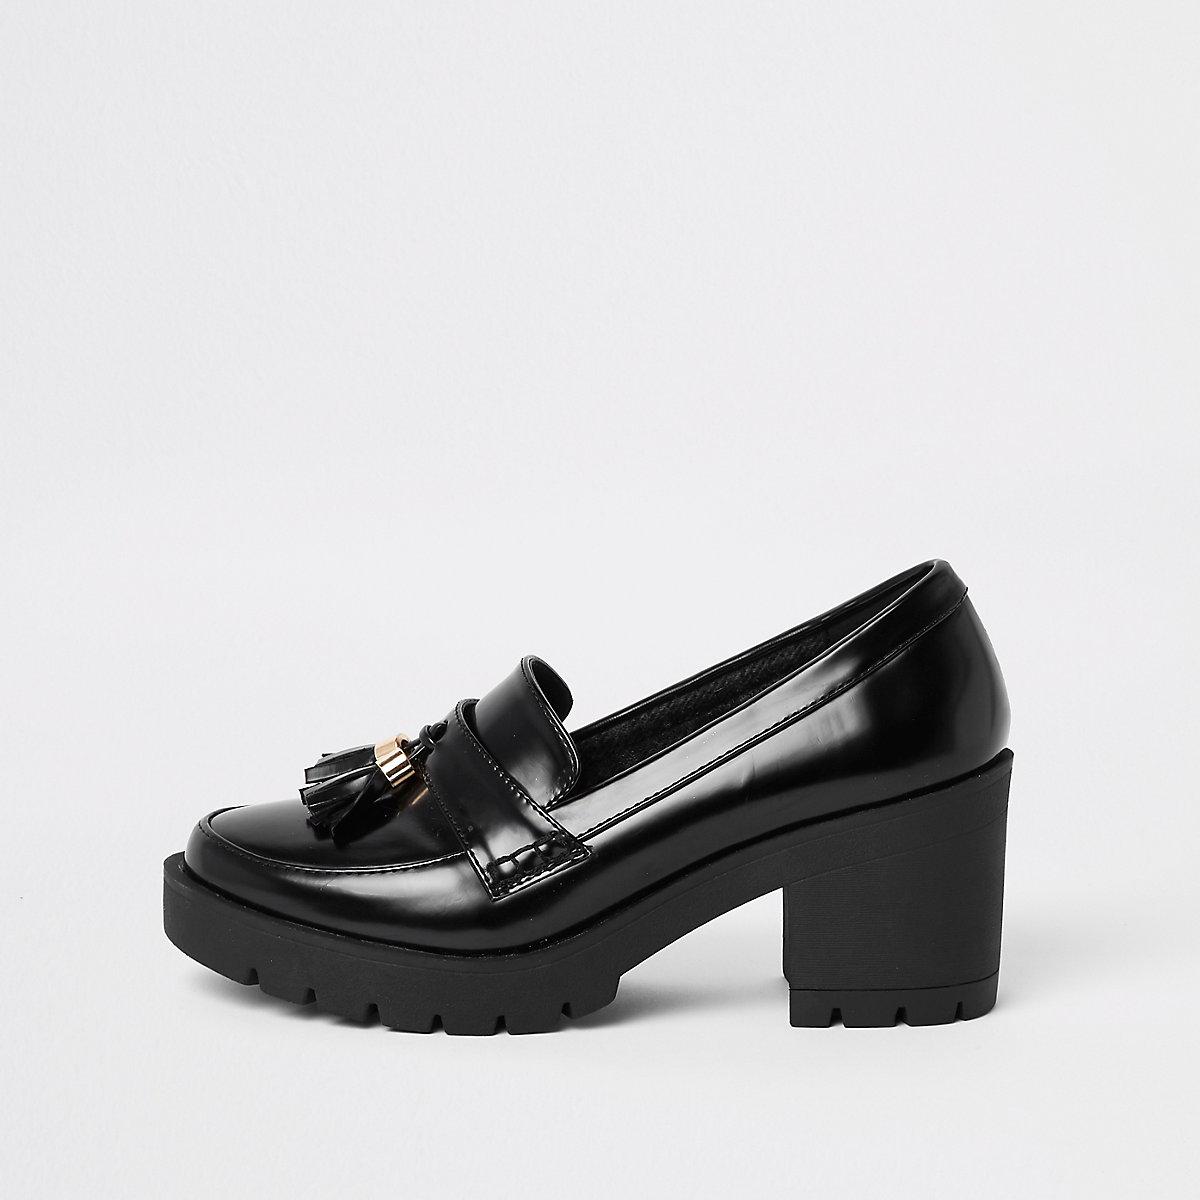 Stevige zwarte loafers met blokhak en kwastjes